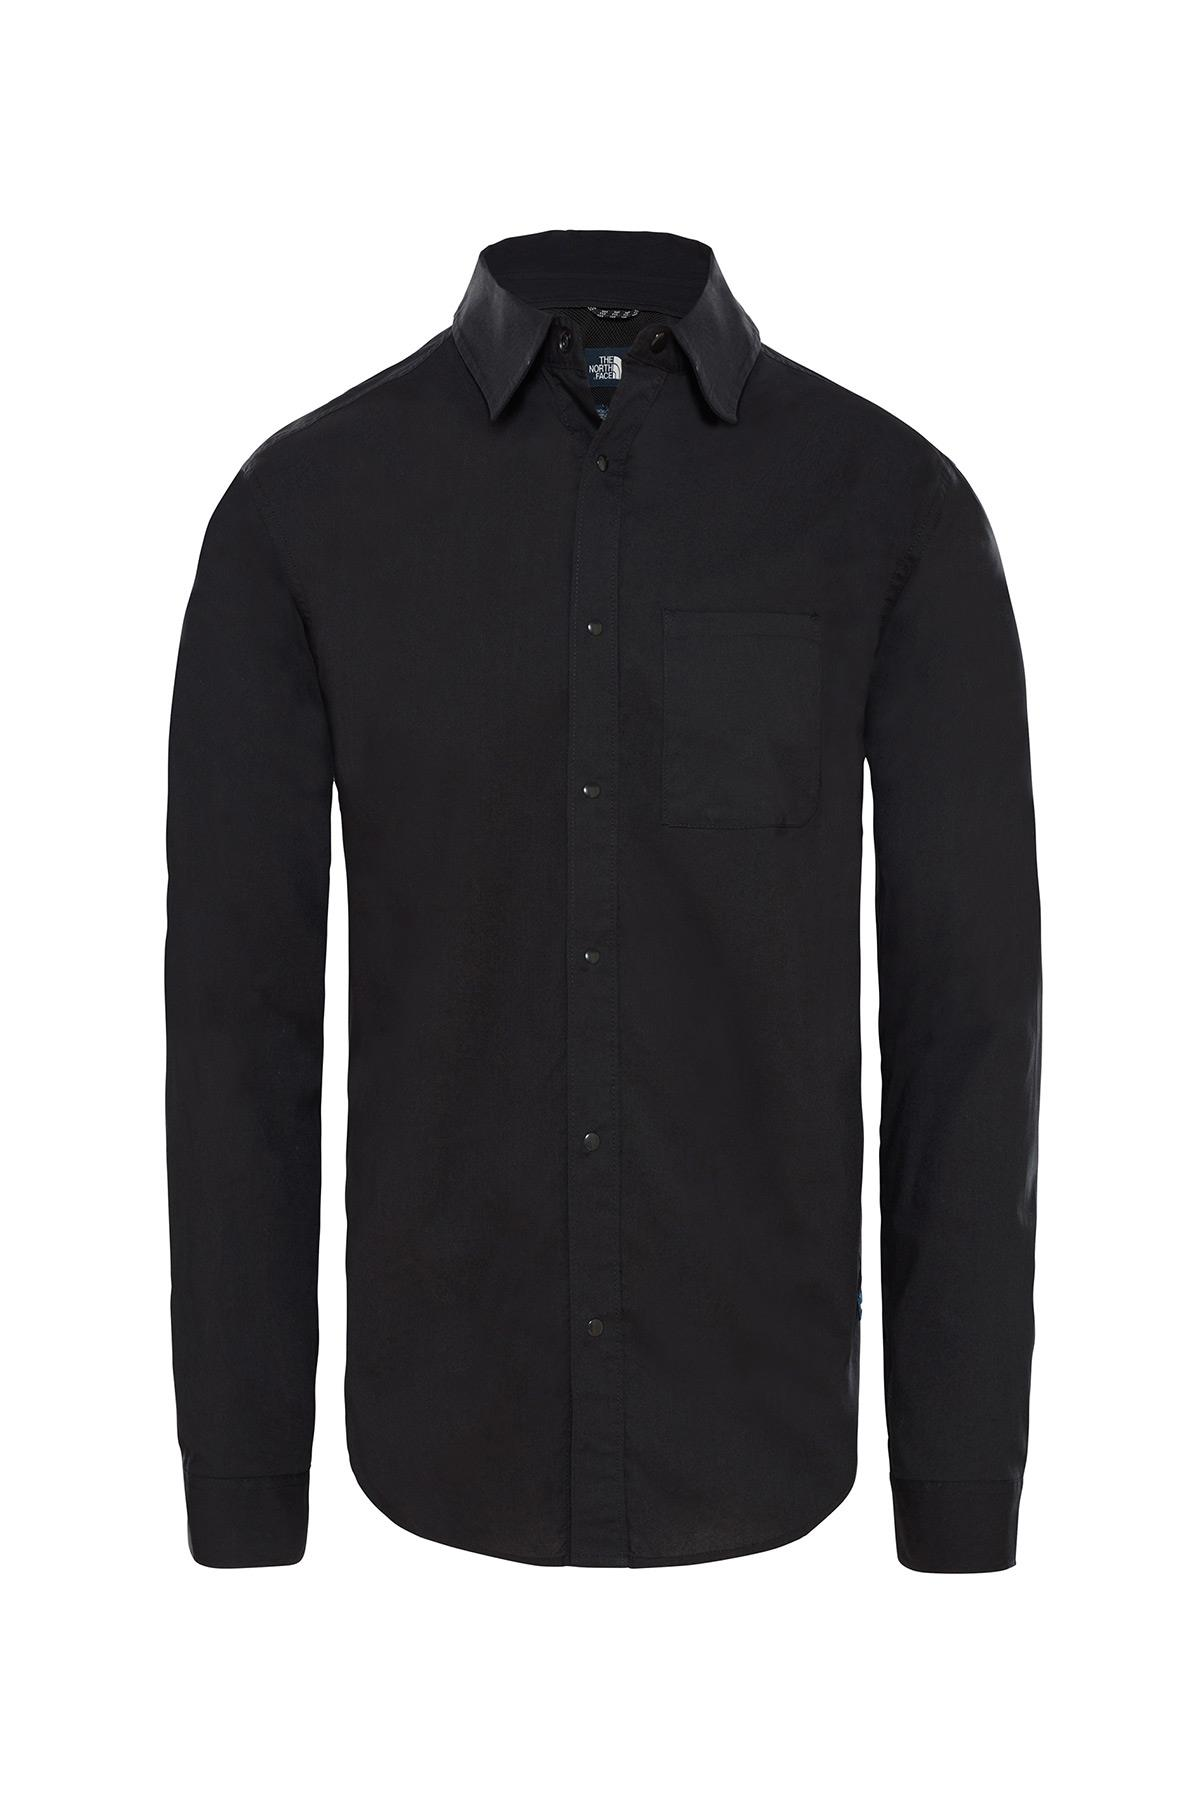 The Northface Erkek L/S Watkins Shirt T93T1Tjk3 Gömlek